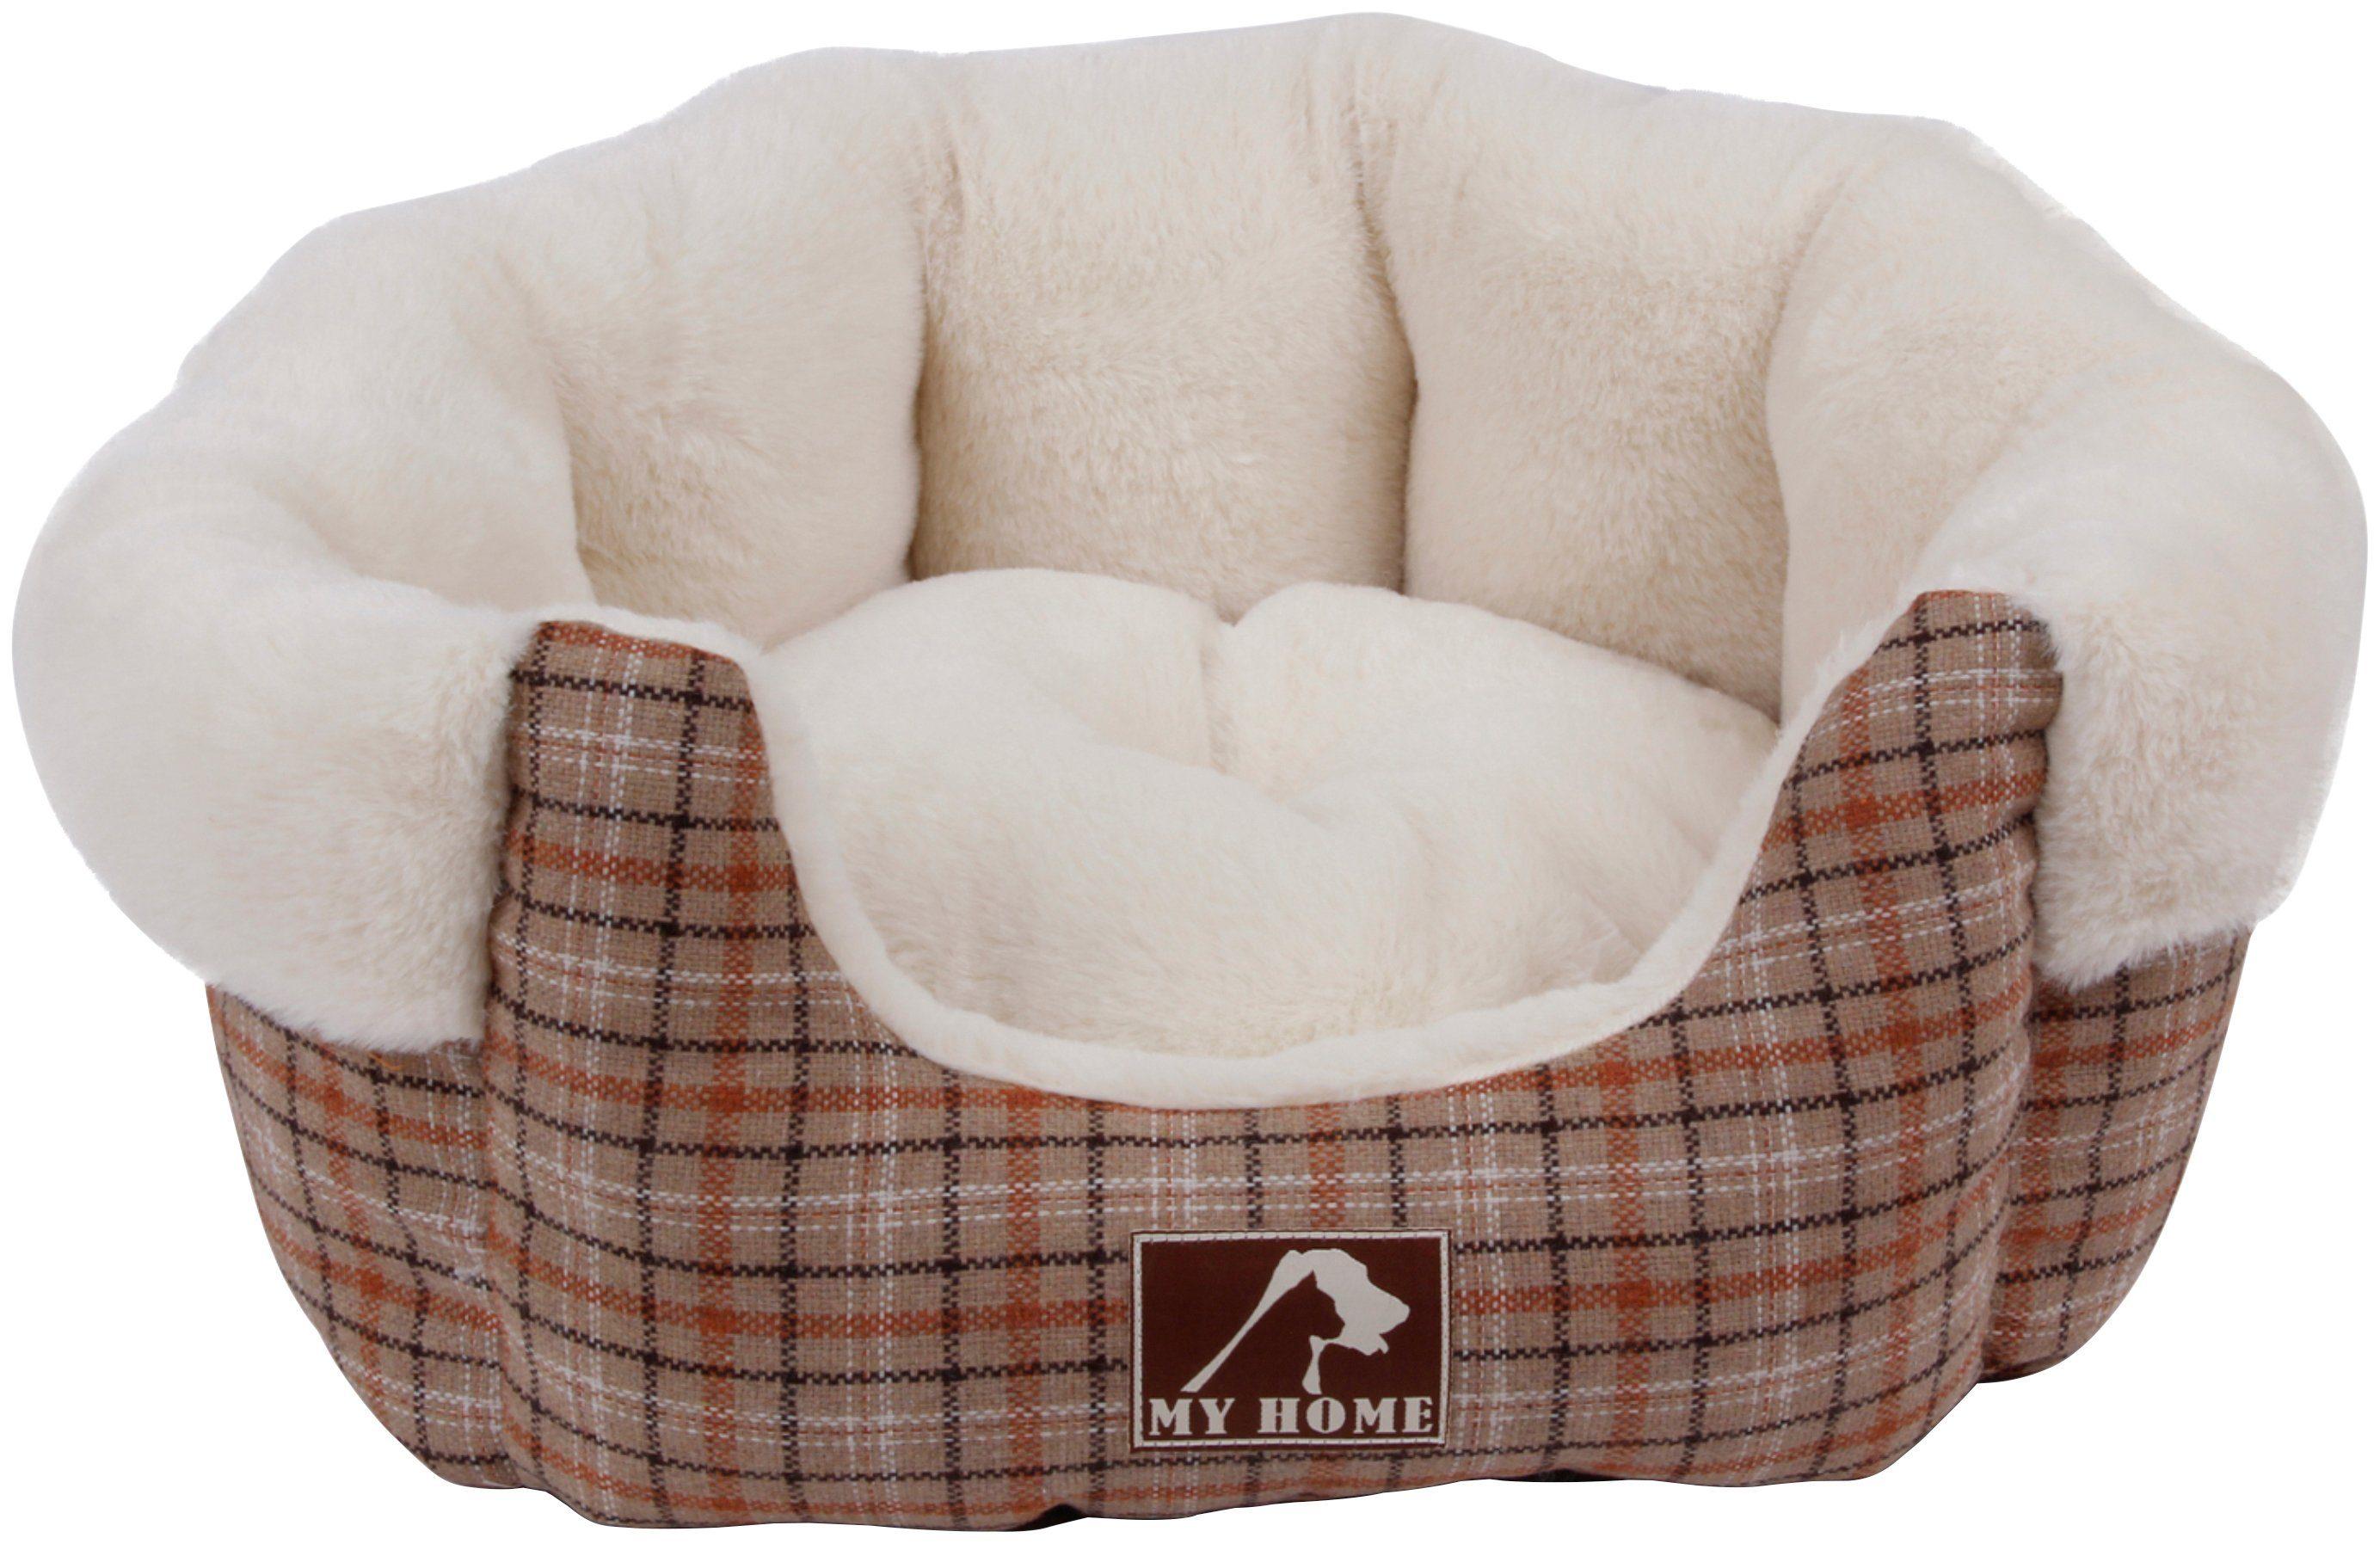 HEIM Hundebett und Katzenbett »Classic«, beige, BxT: 62x72 cm